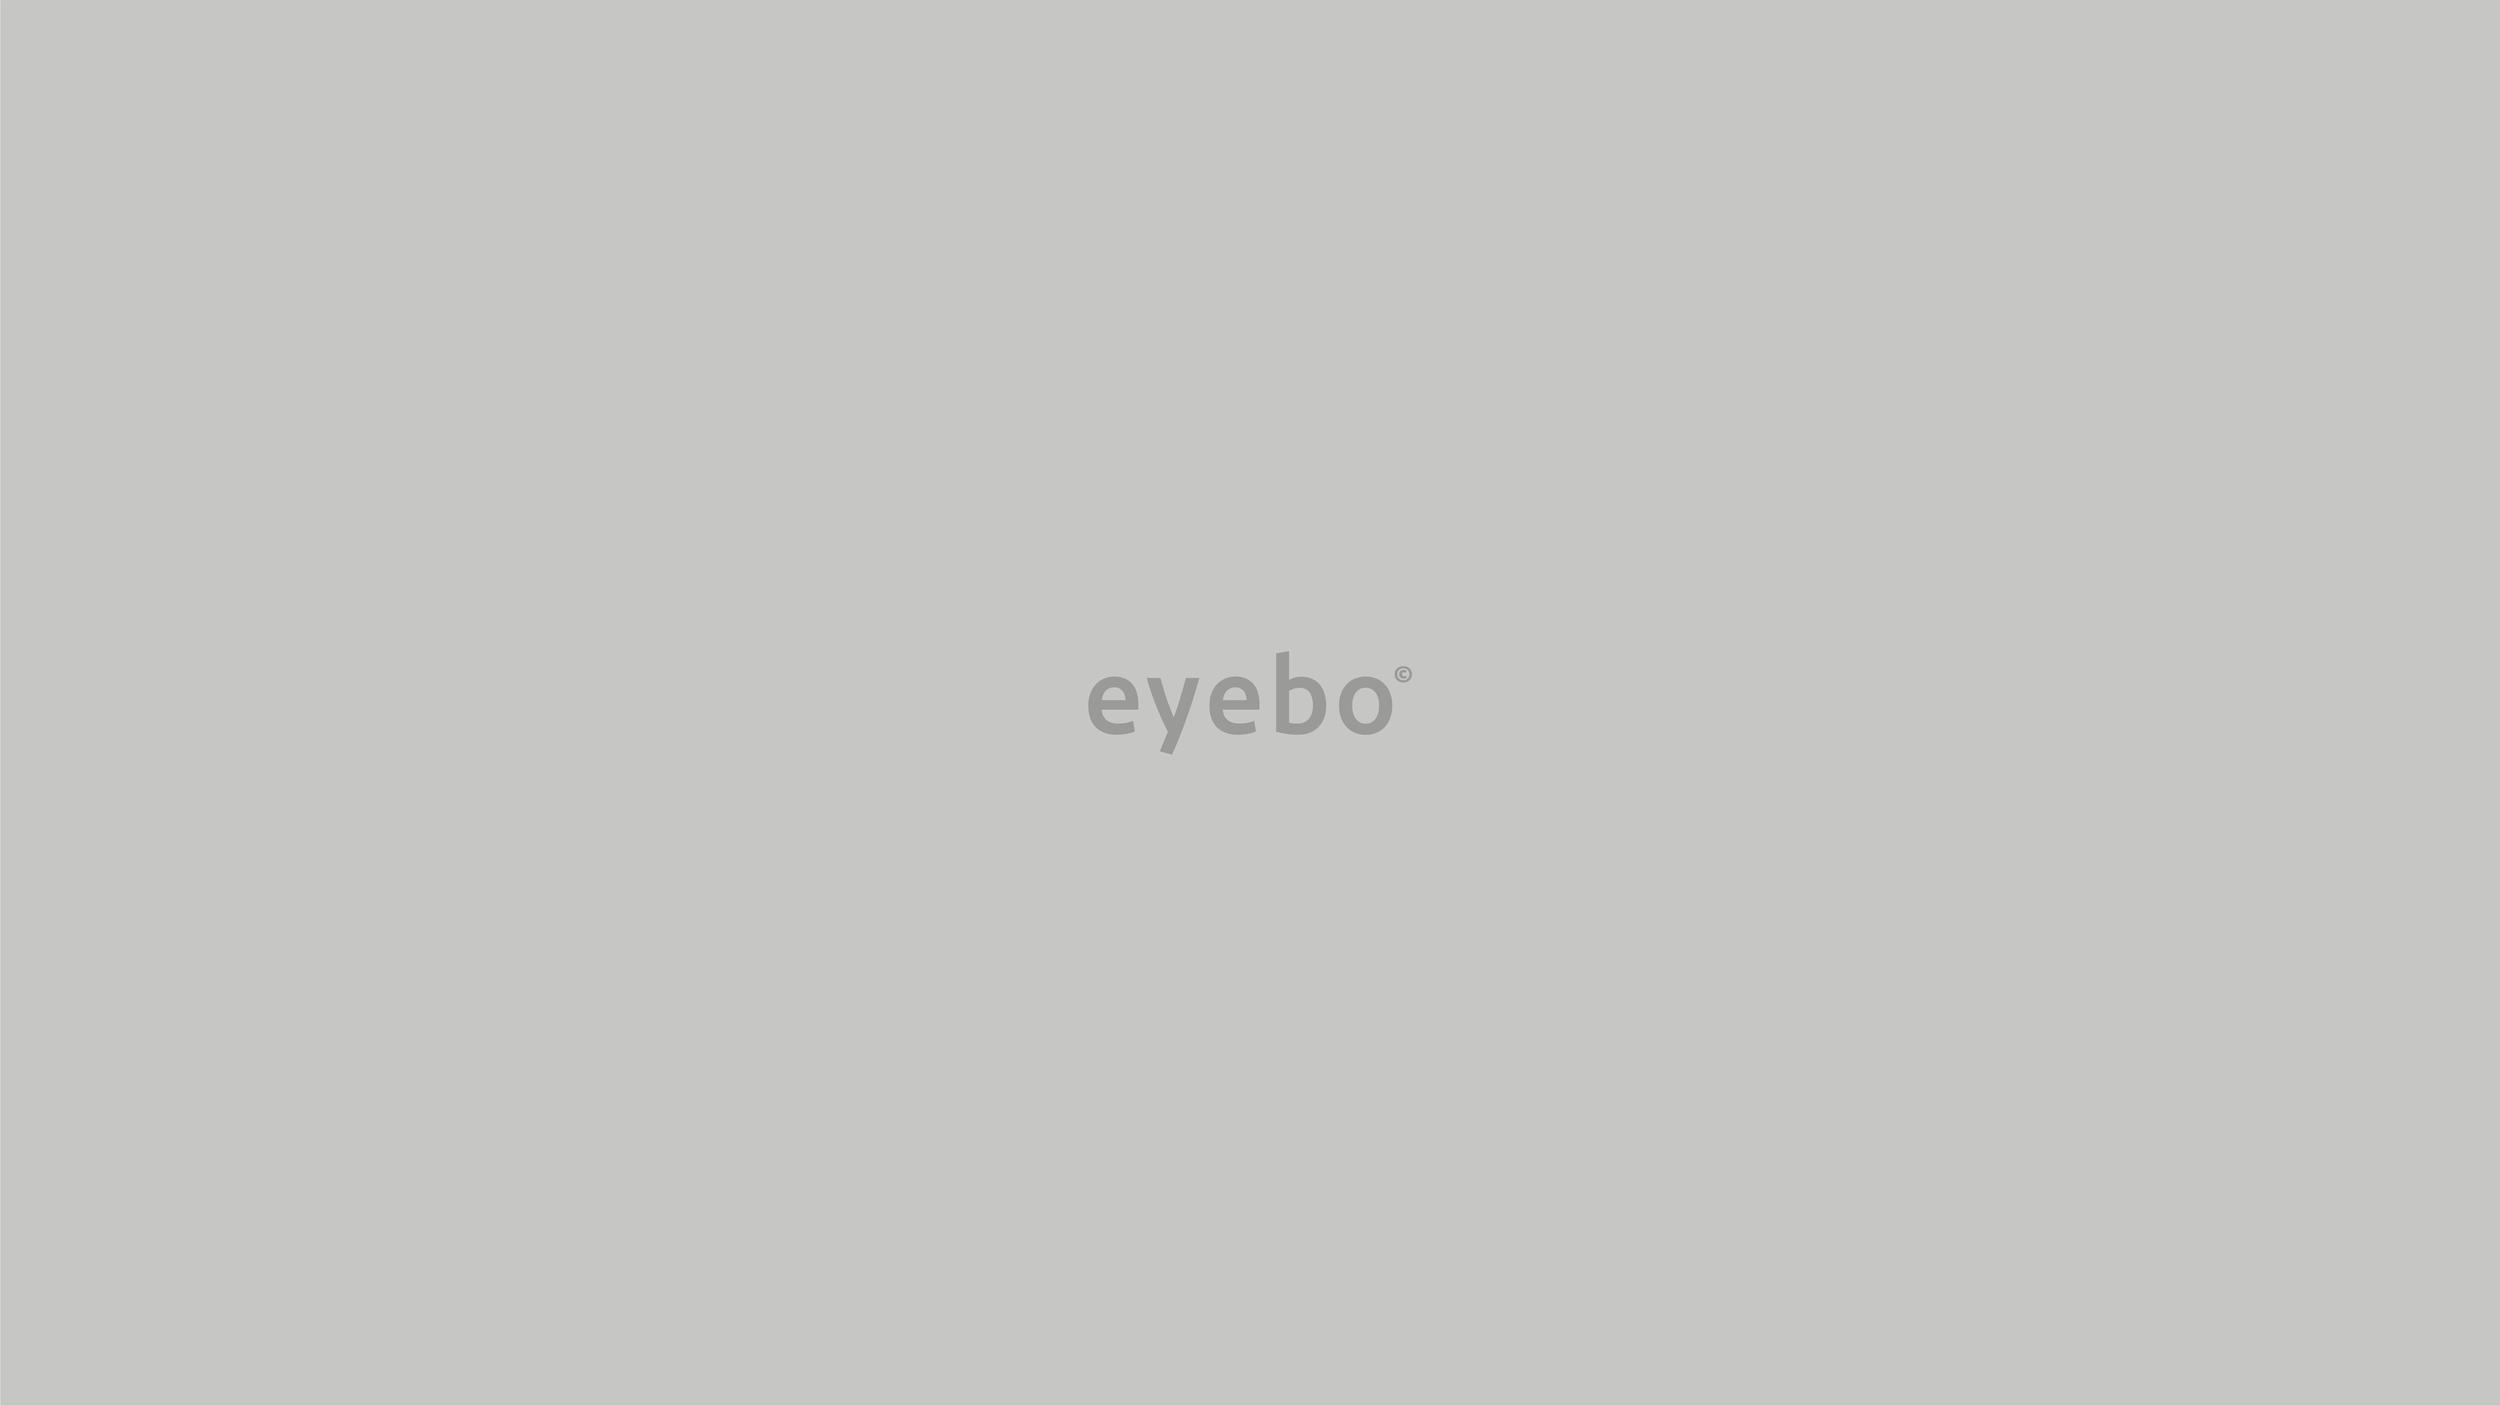 Eyebo  Smart device prototype's logo